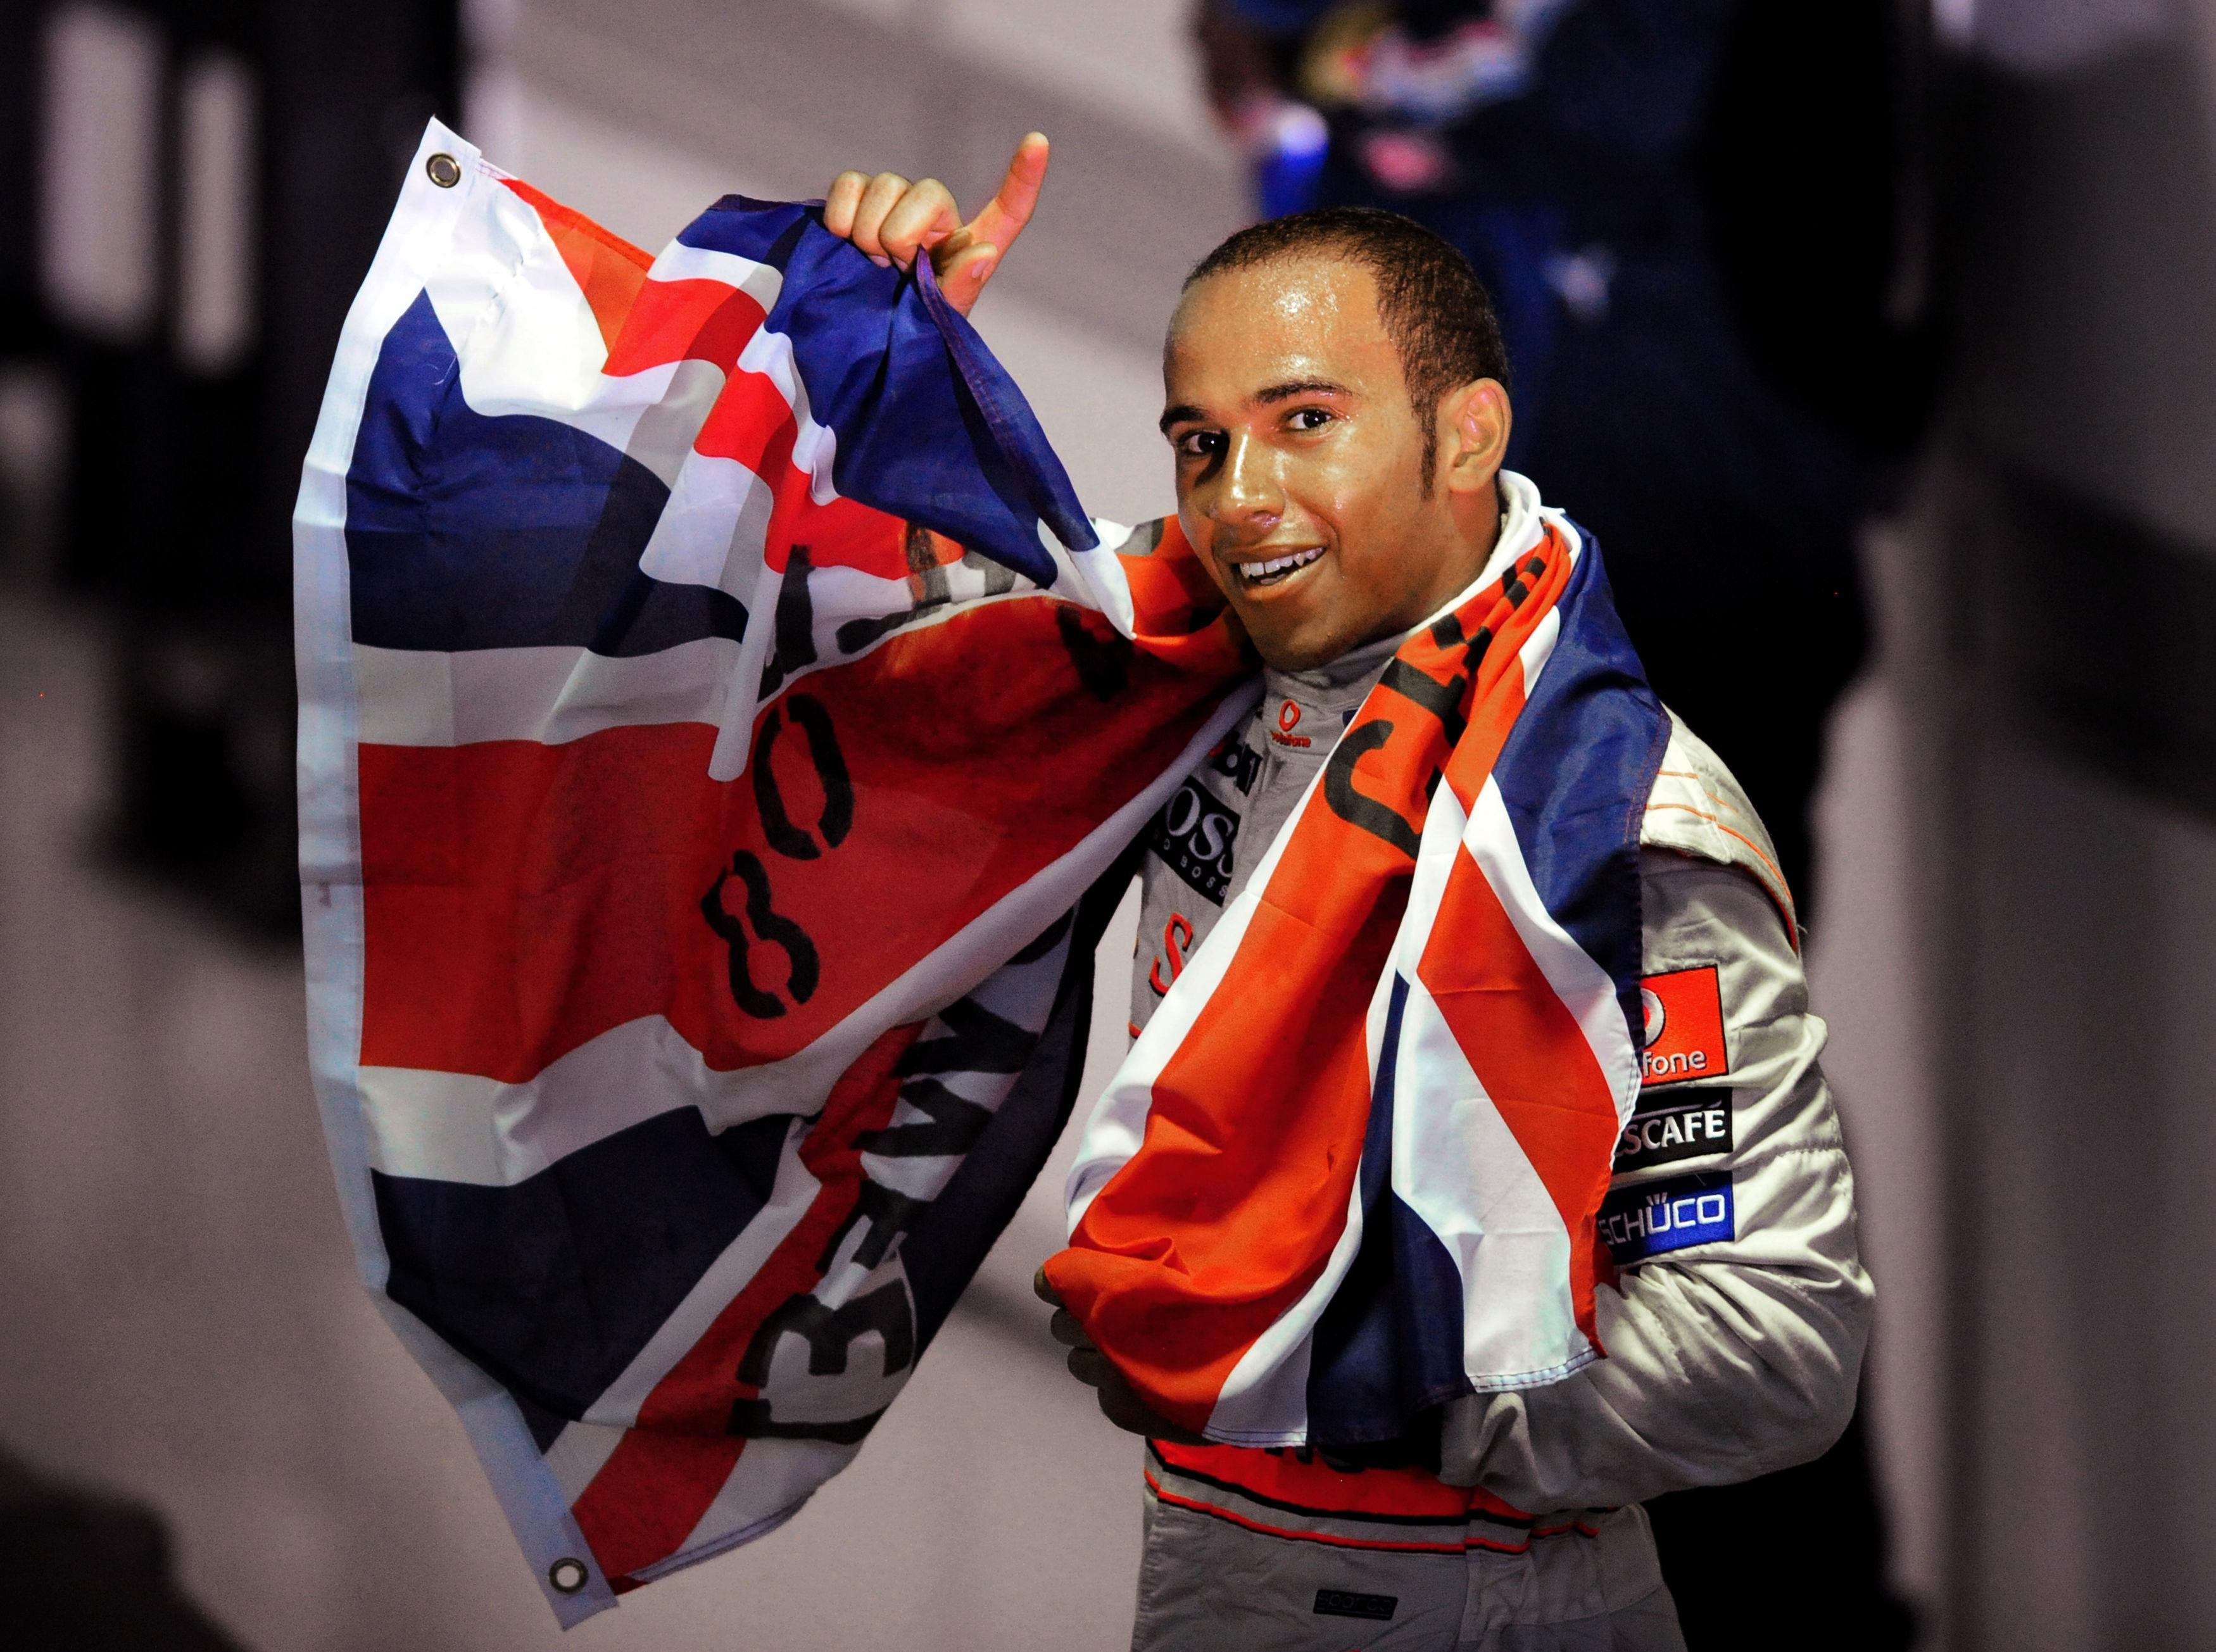 Hamilton won his fourth world championship at the Brazilian Grand Prix last November